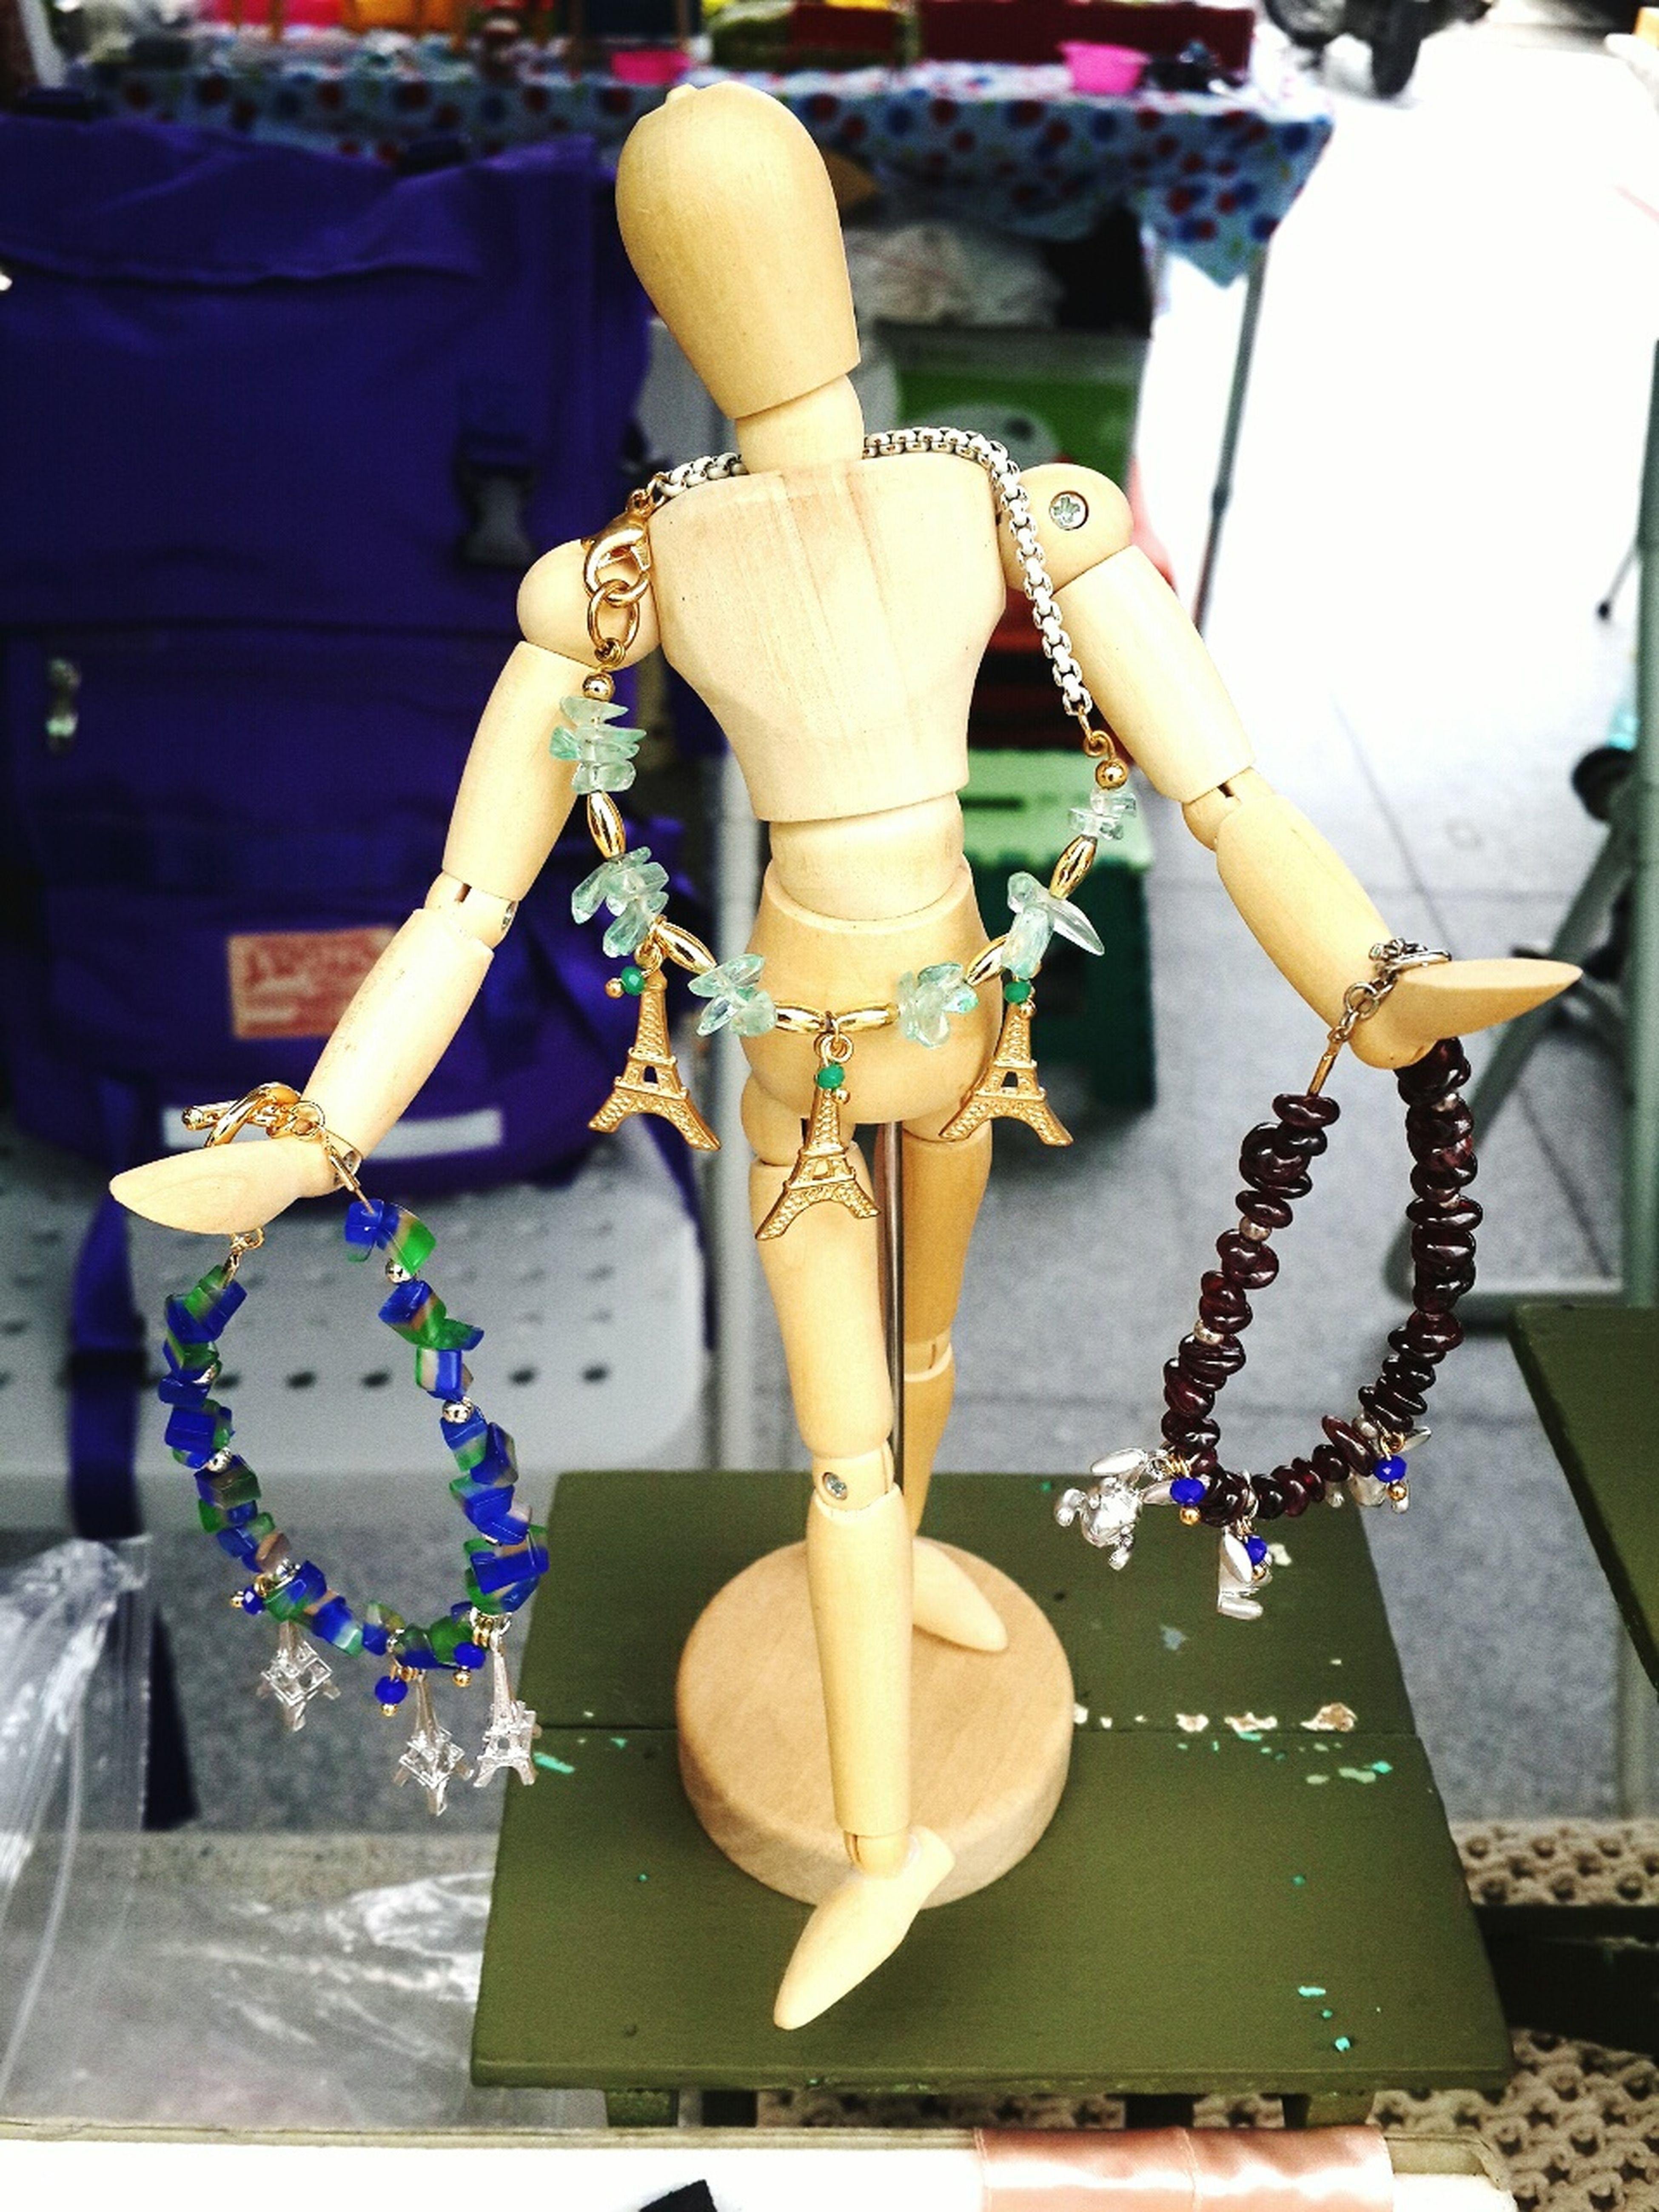 Shopping Handmade Jewellery New Design  Taking Photos